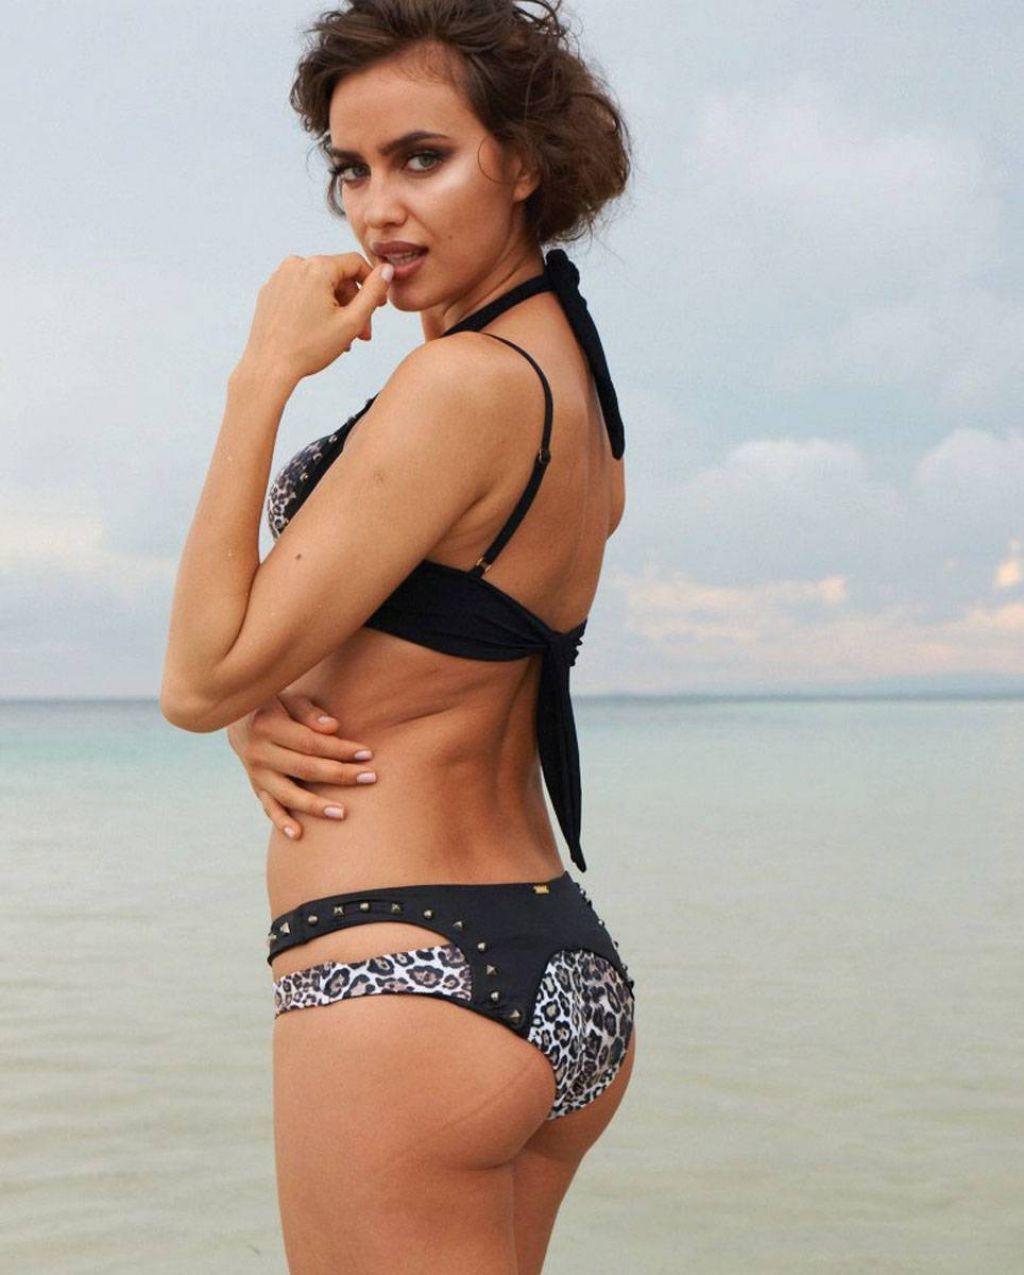 Irina Shayk Photoshoot - Beach Bunny 2014